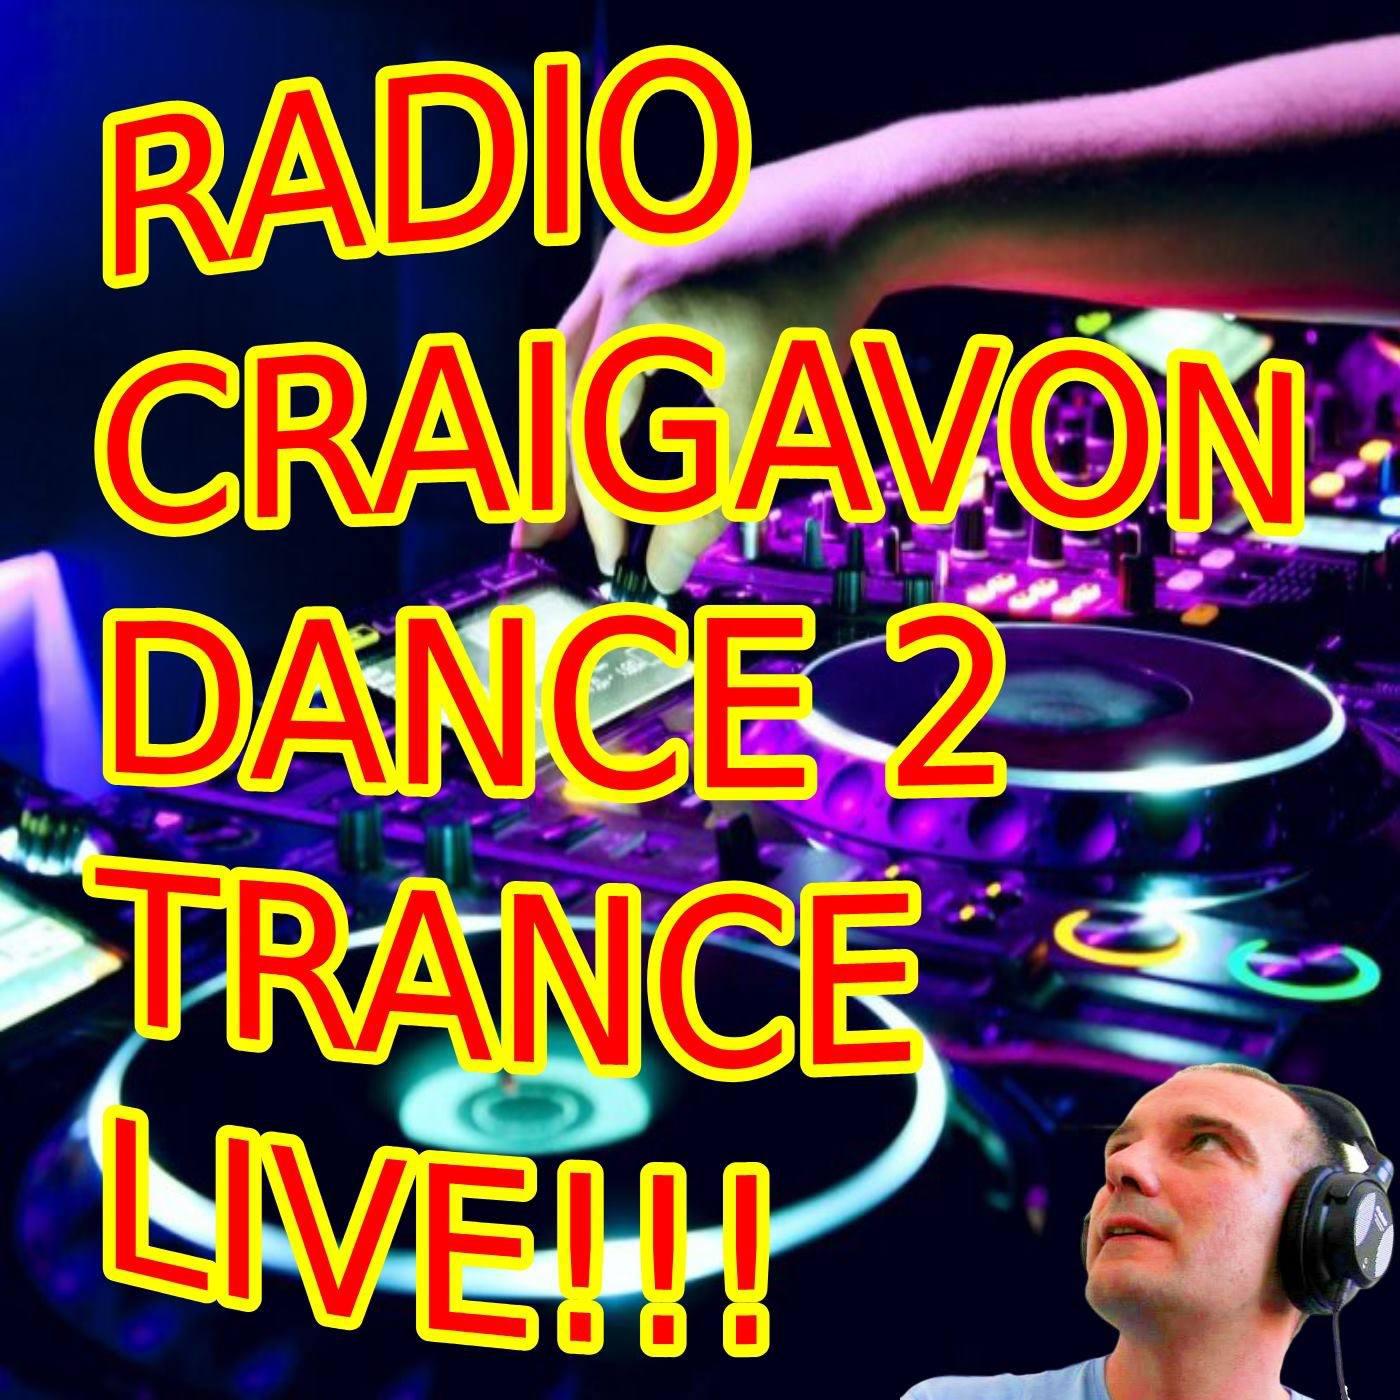 Dance 2 Trance LIVE #121